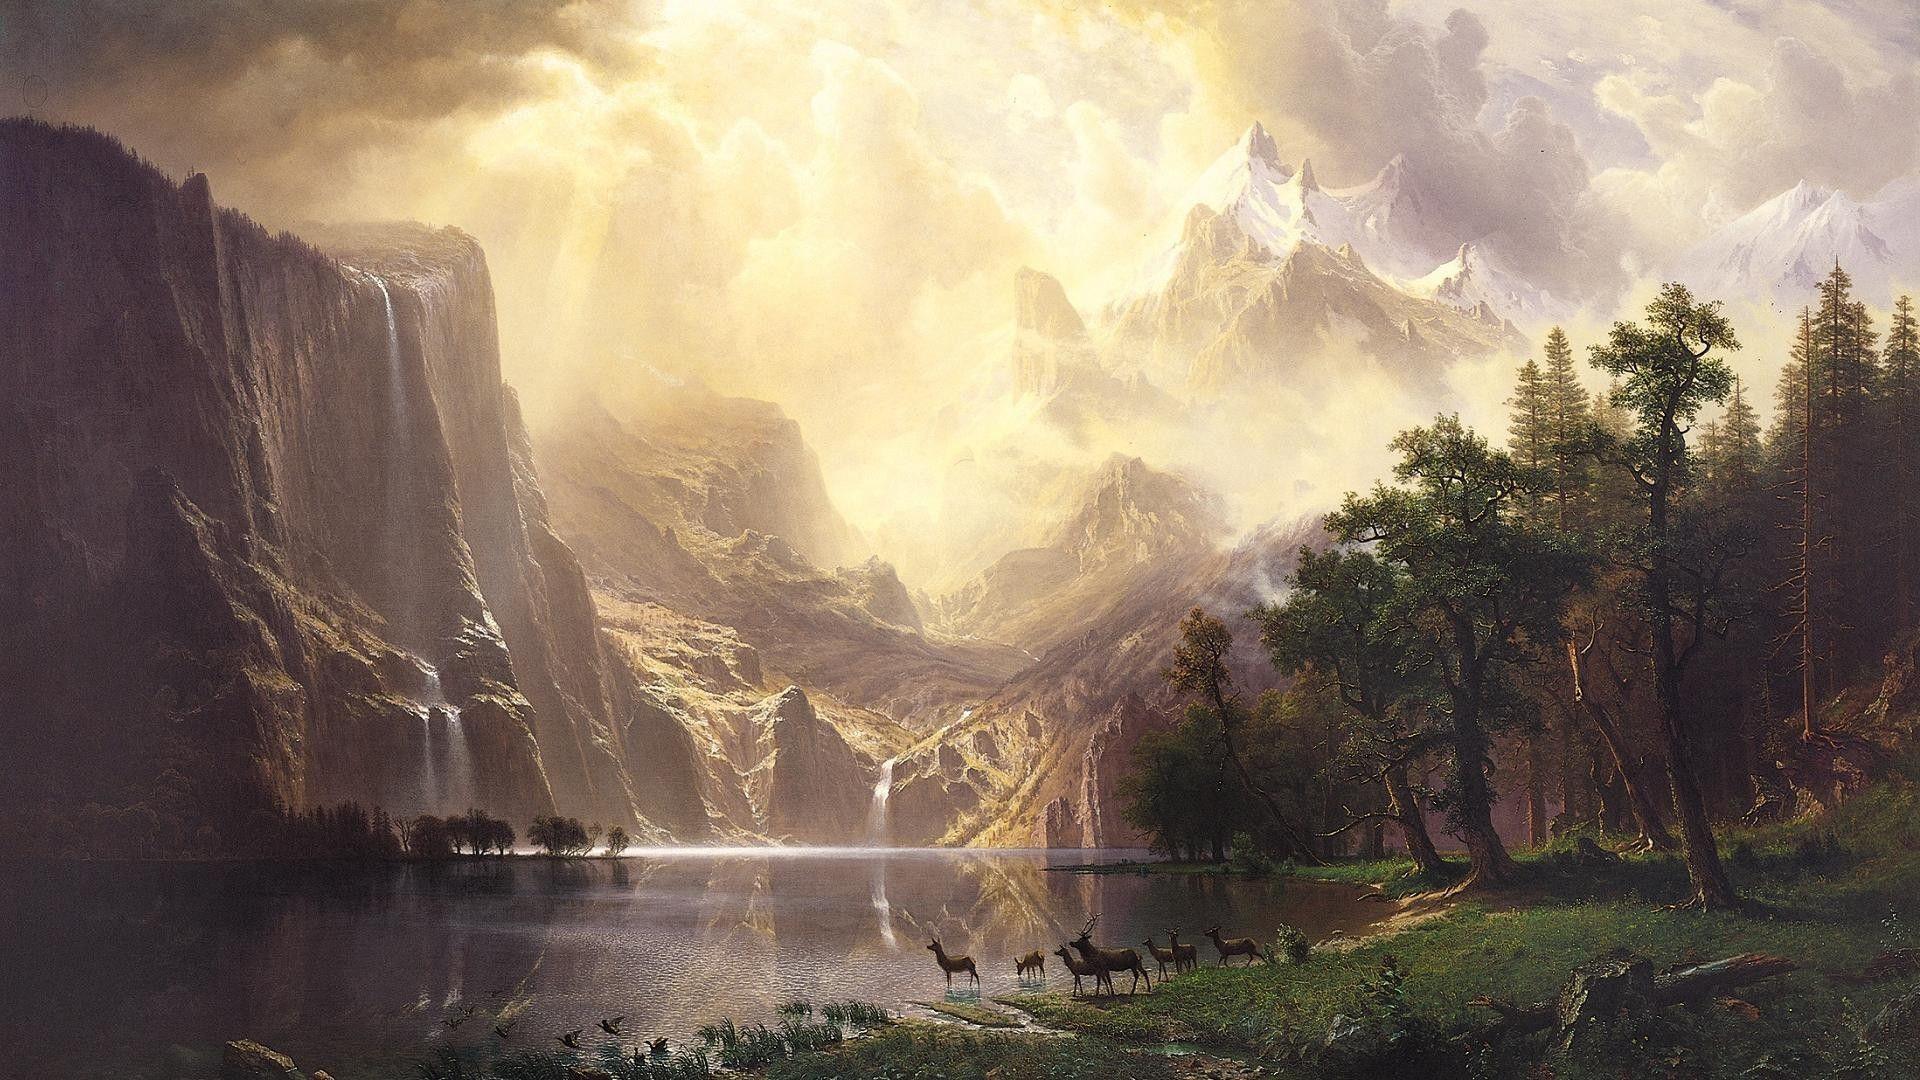 Digital Art Background wallpaper picture